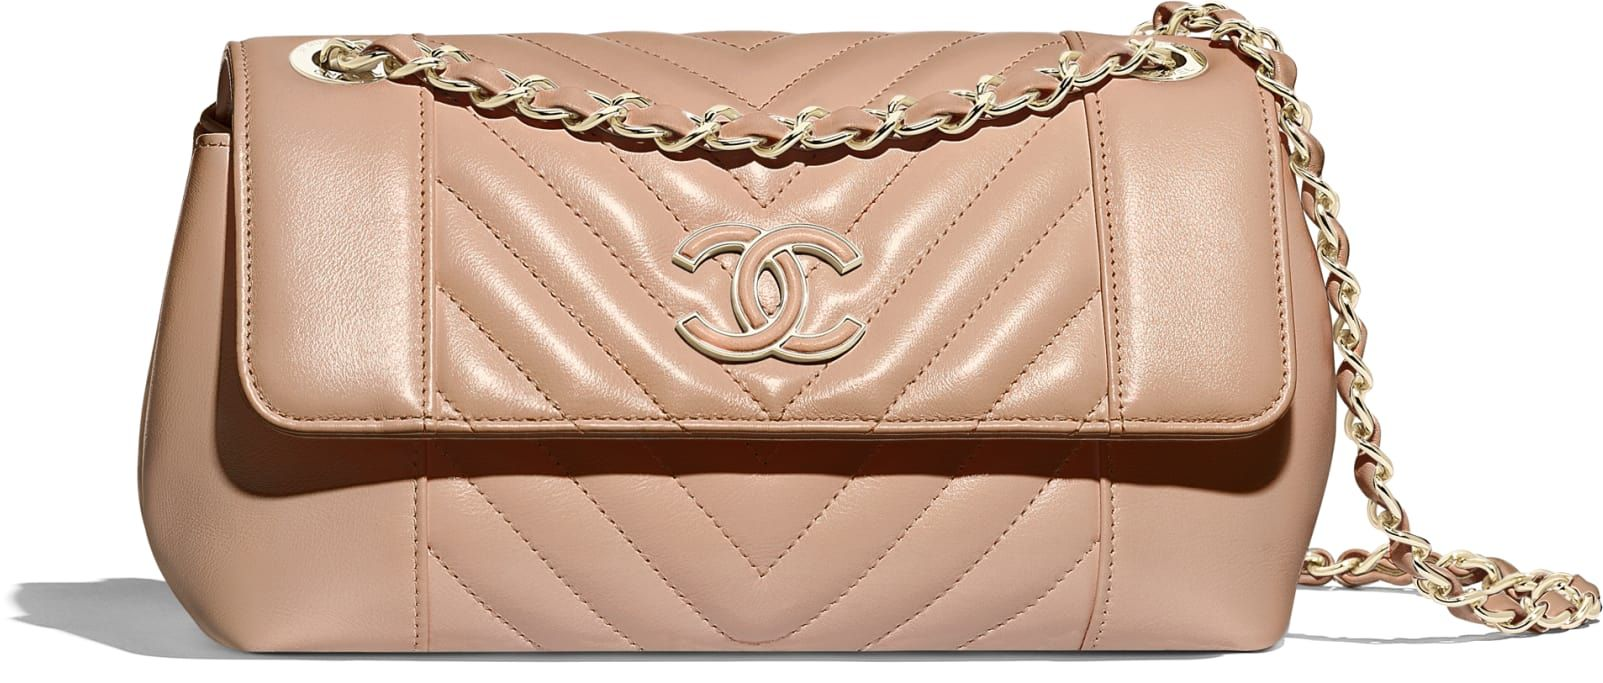 48565f126 Bolsa, couro de novilho & metal dourado., branco. - CHANEL | Chanel ...